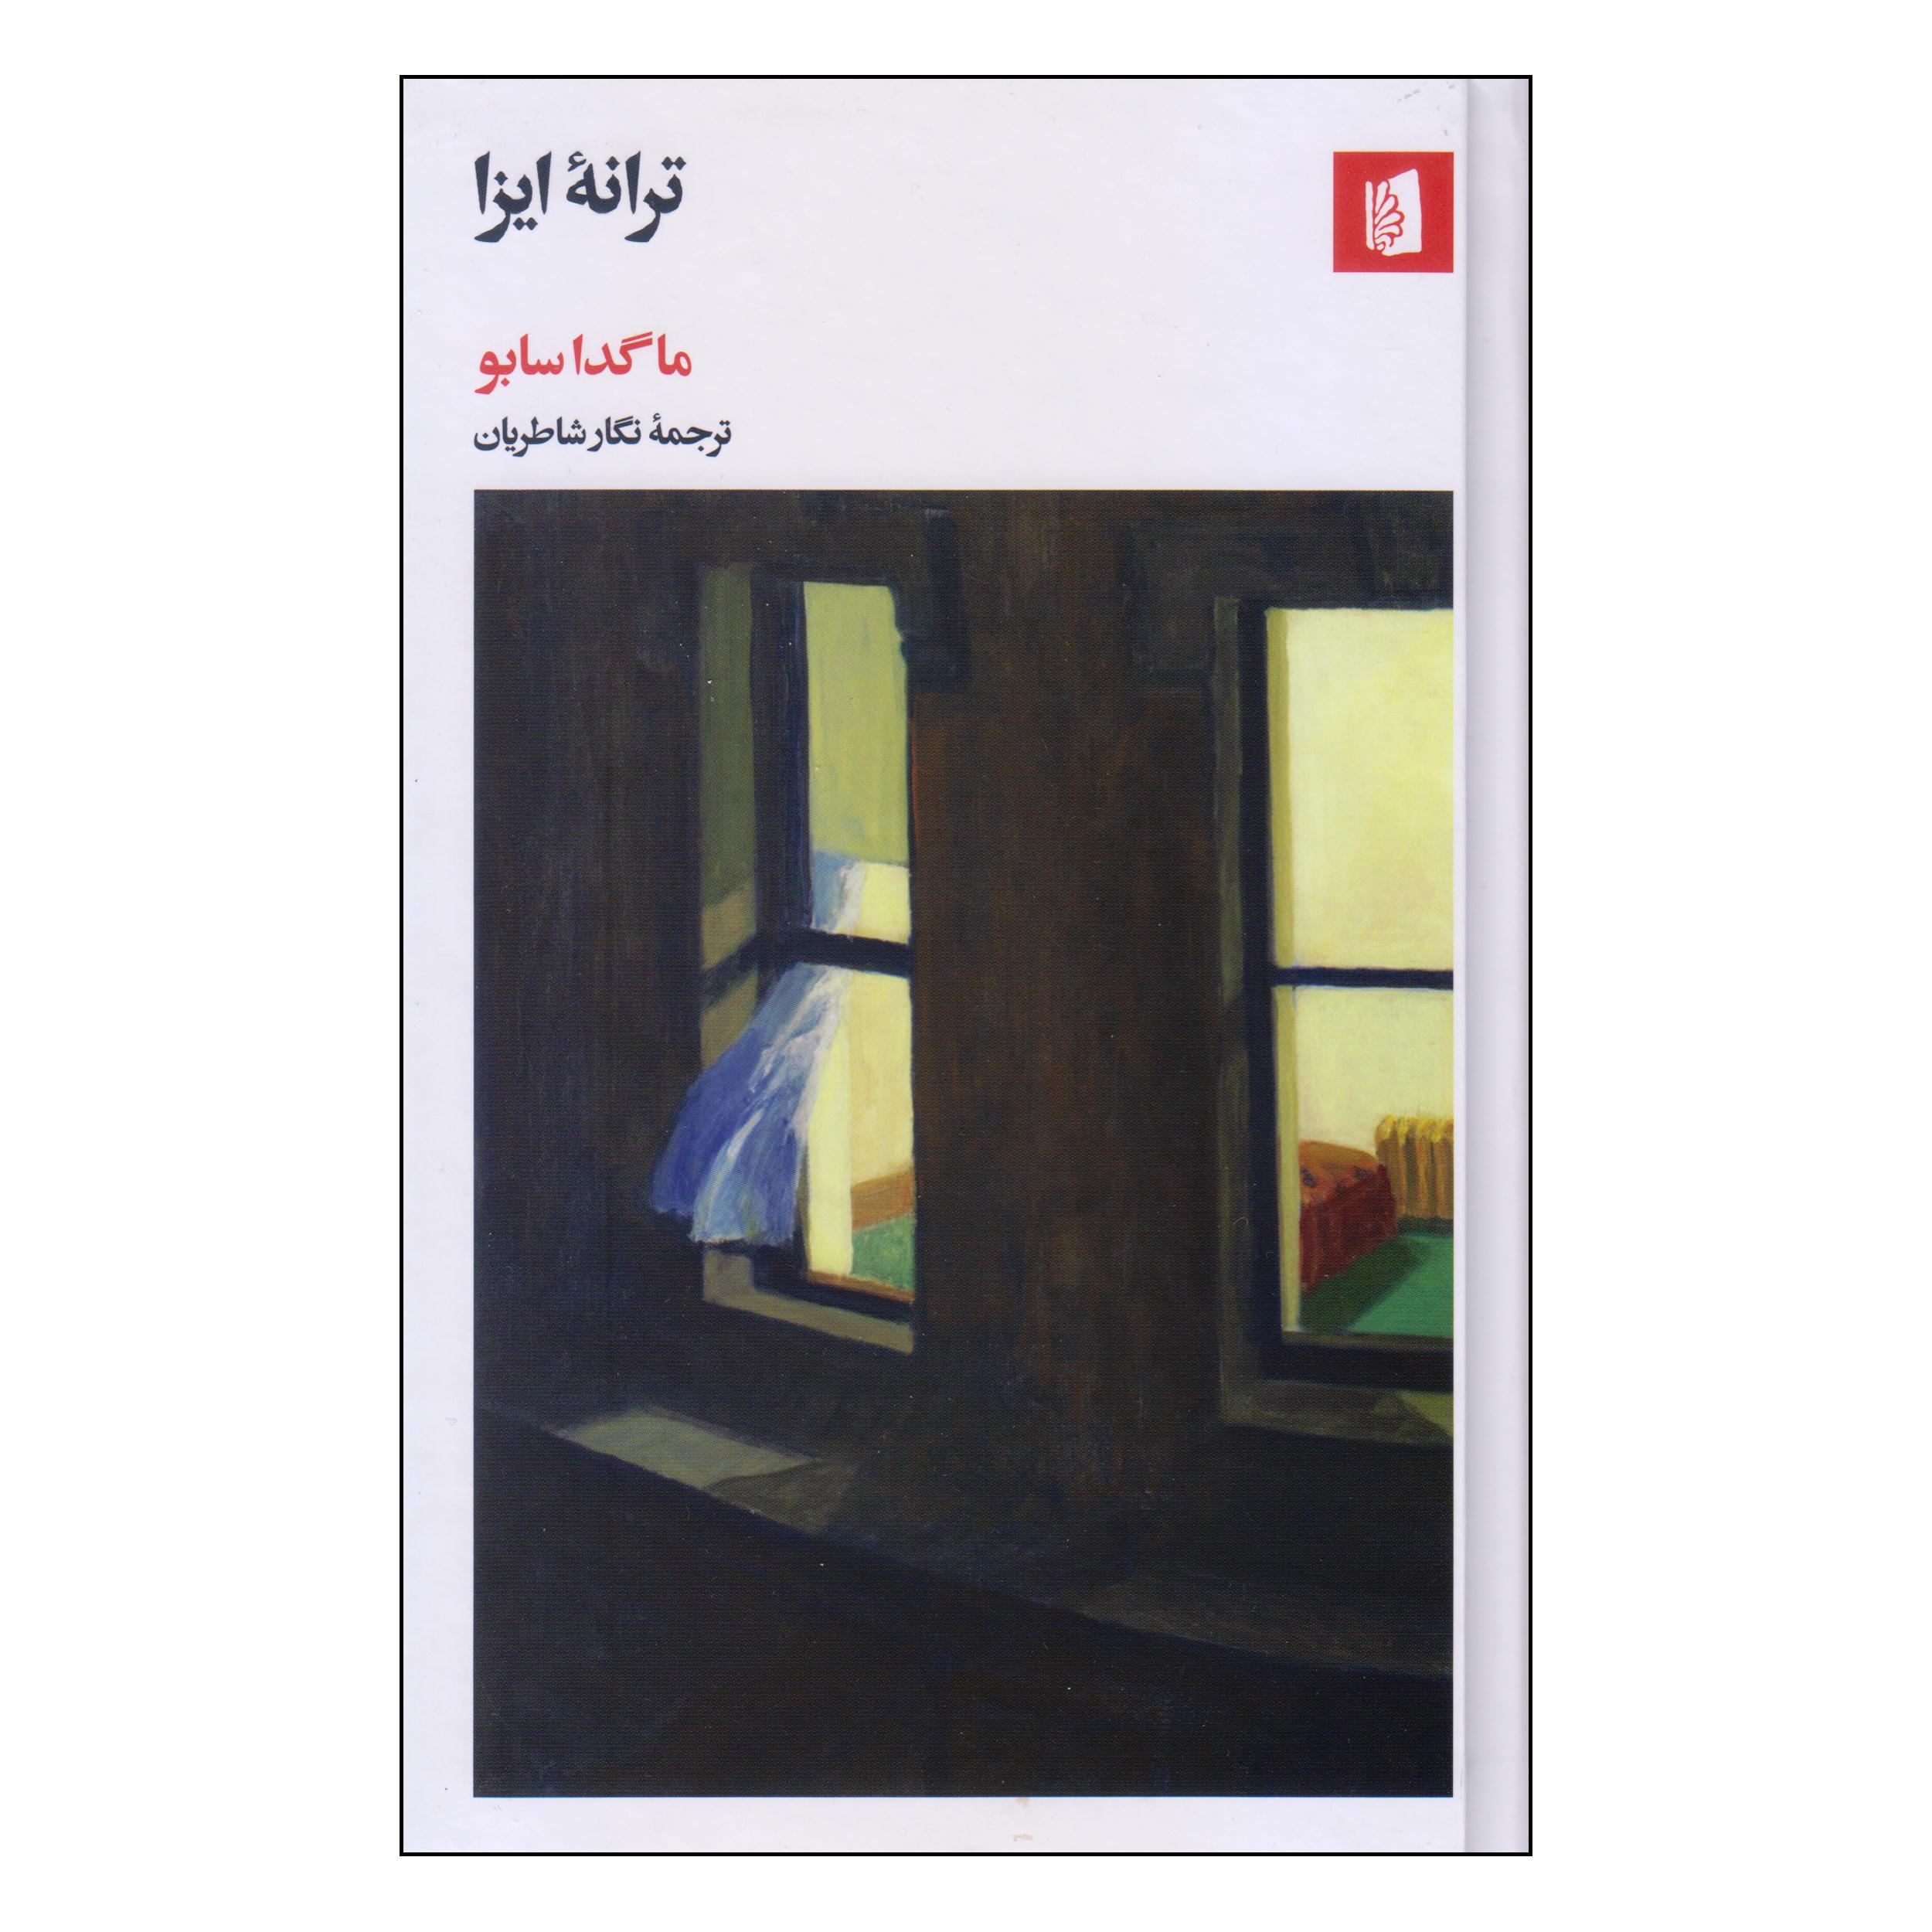 کتاب ترانه ایزا اثر ماگدا سابو نشر بیدگل